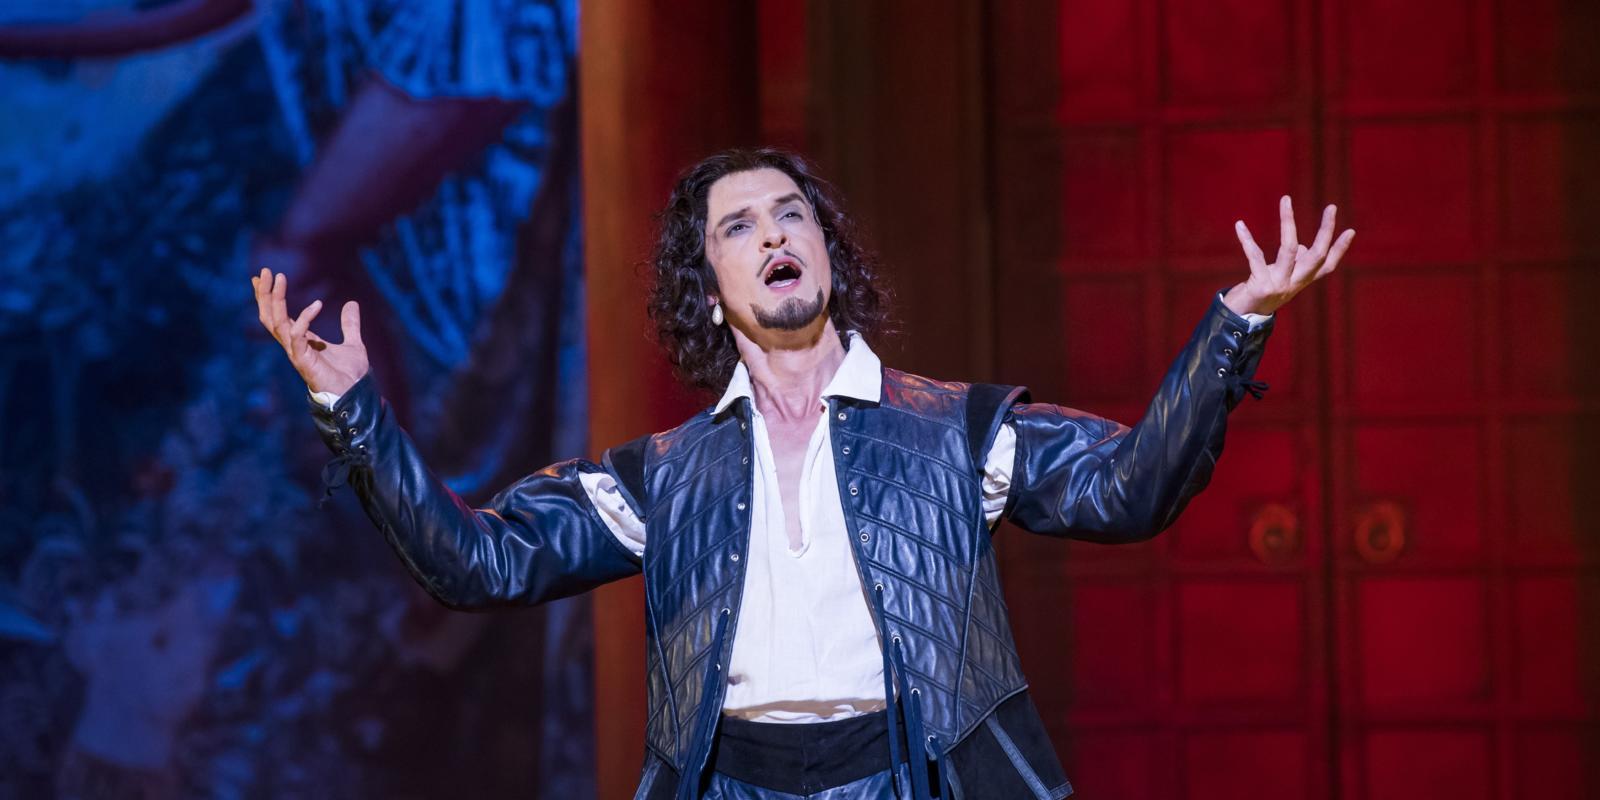 Quirijn de Lang as Petruchio